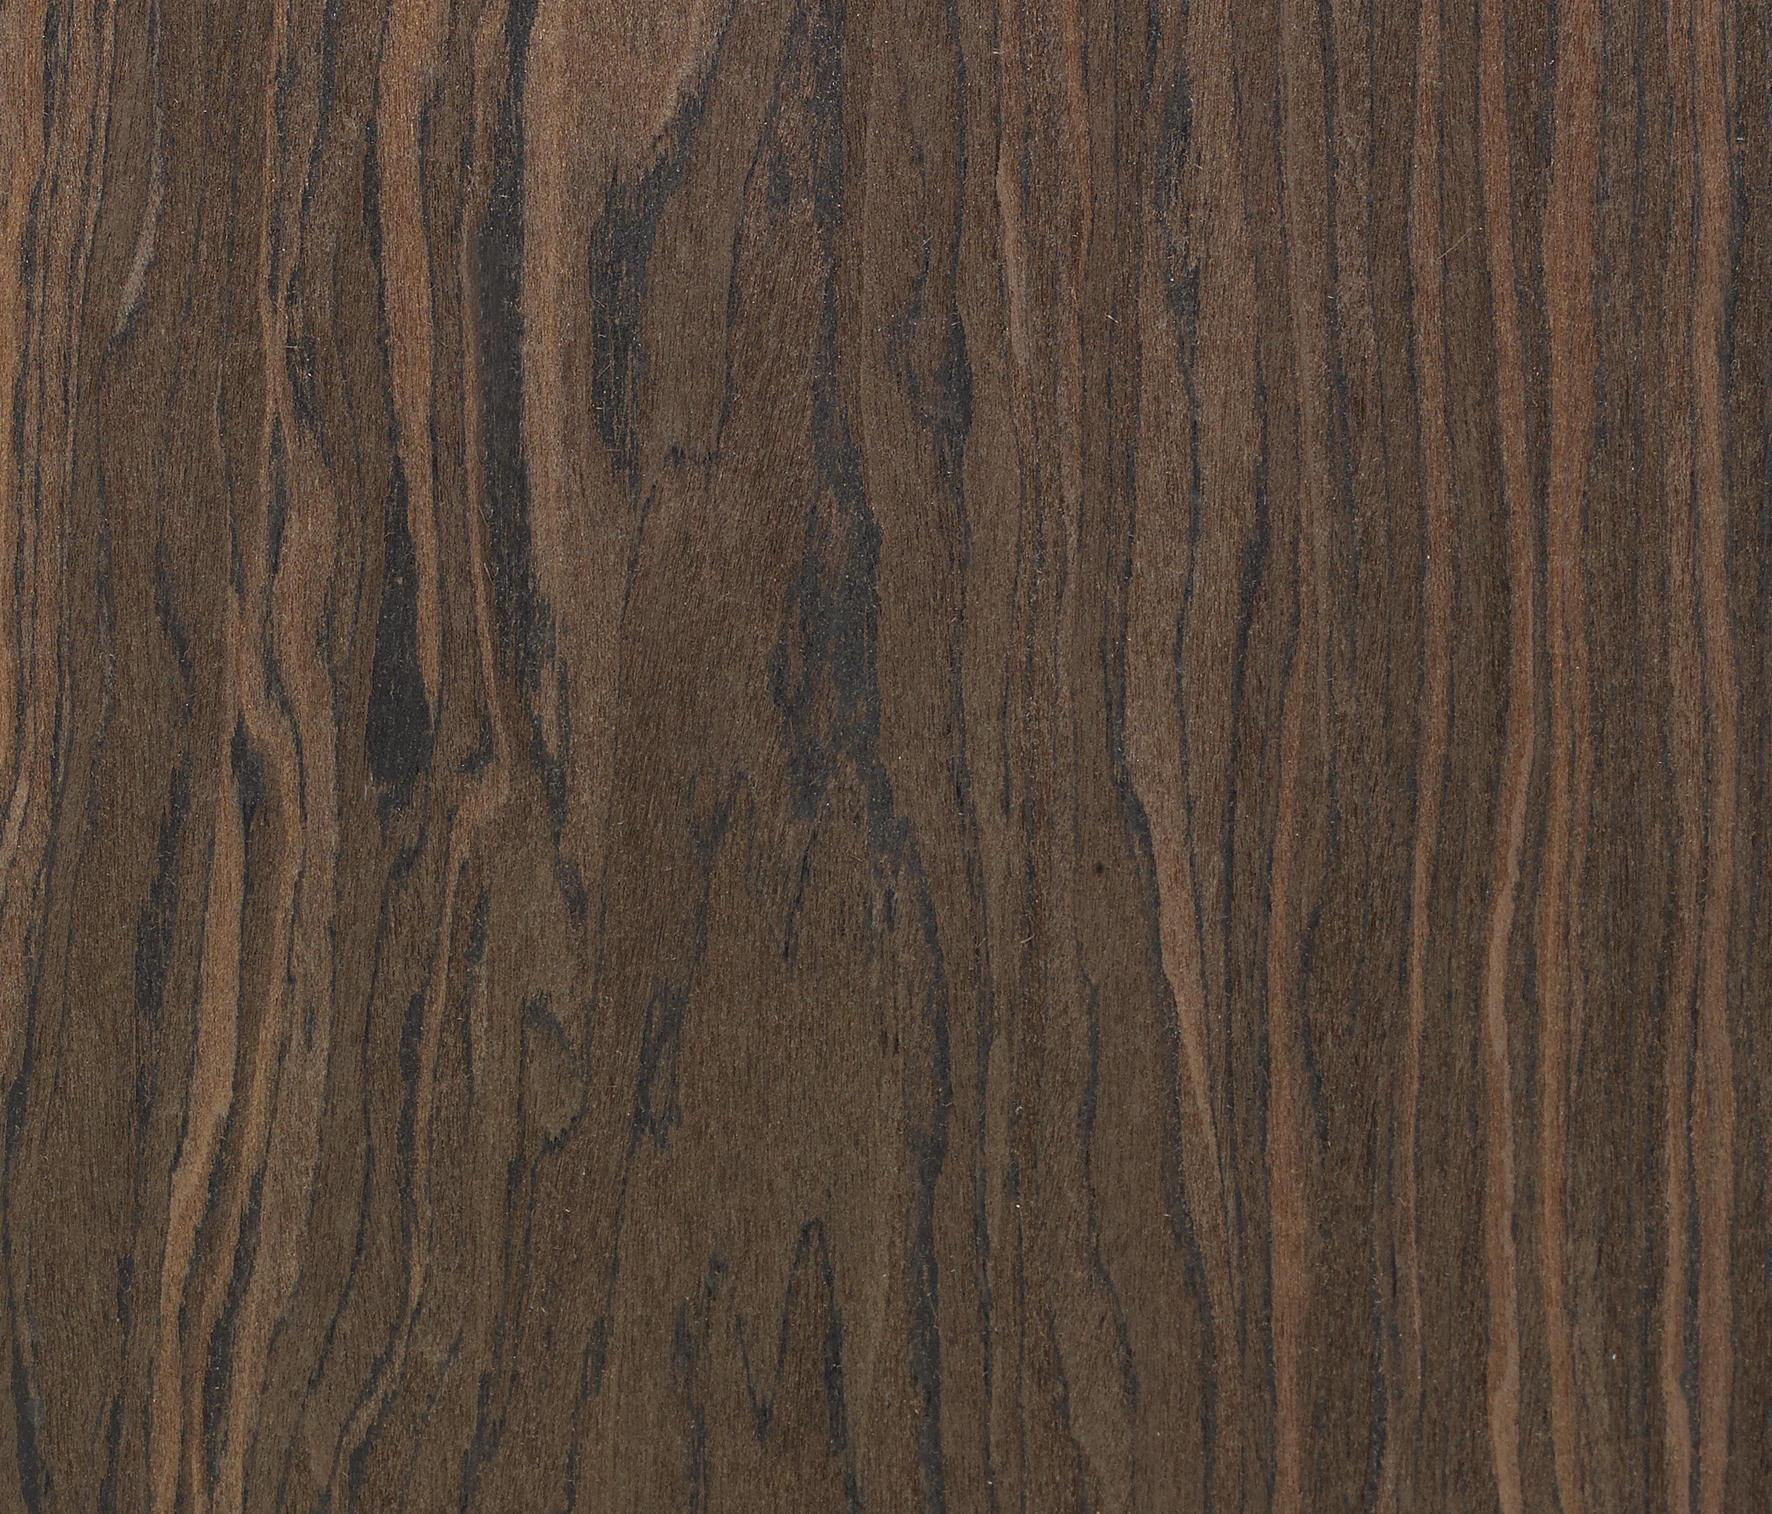 Ecozero An 58 022 Wood Flooring Tabu